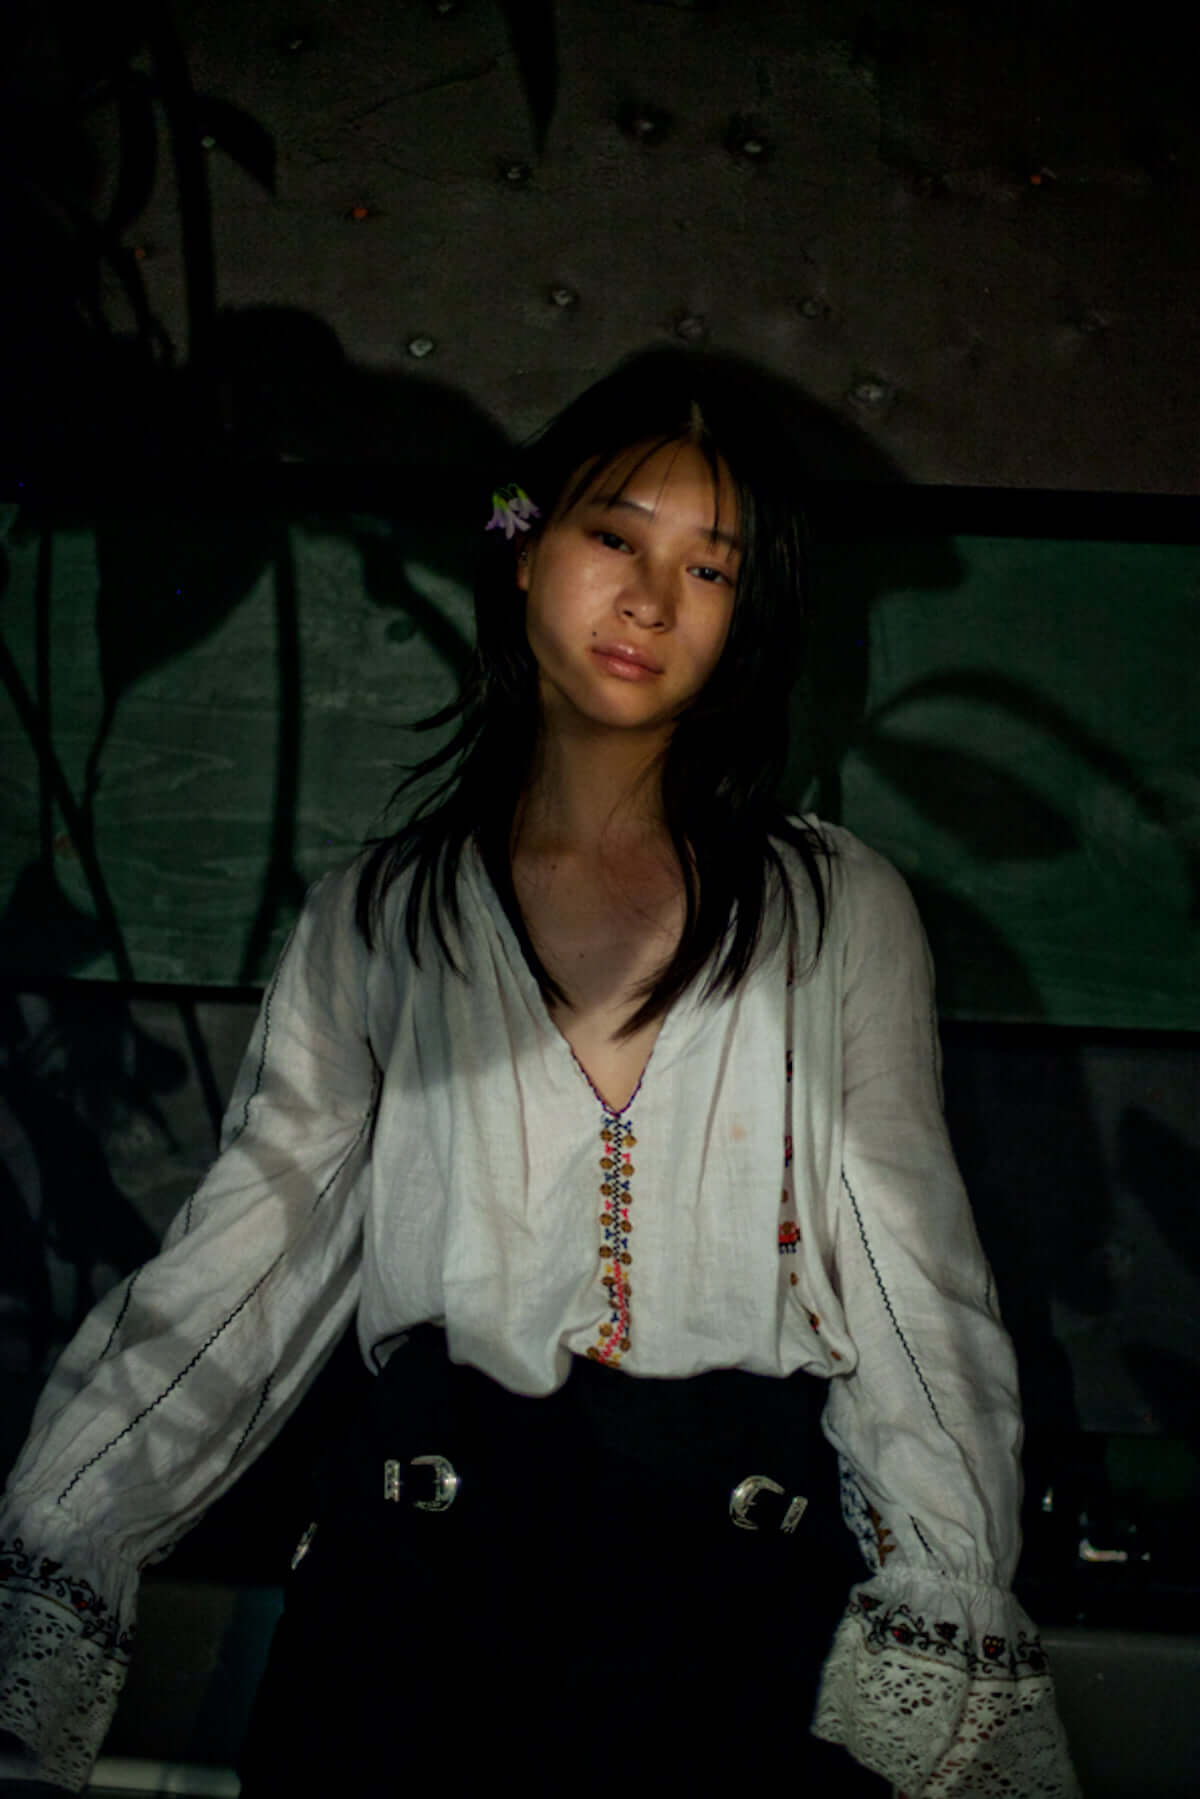 miu(ミユ)や仙人掌がモデルを務めるブランドLehが音楽イベント「BEATZOKU」を恵比寿BATICAにて開催 music190318-leh-4-1200x1799